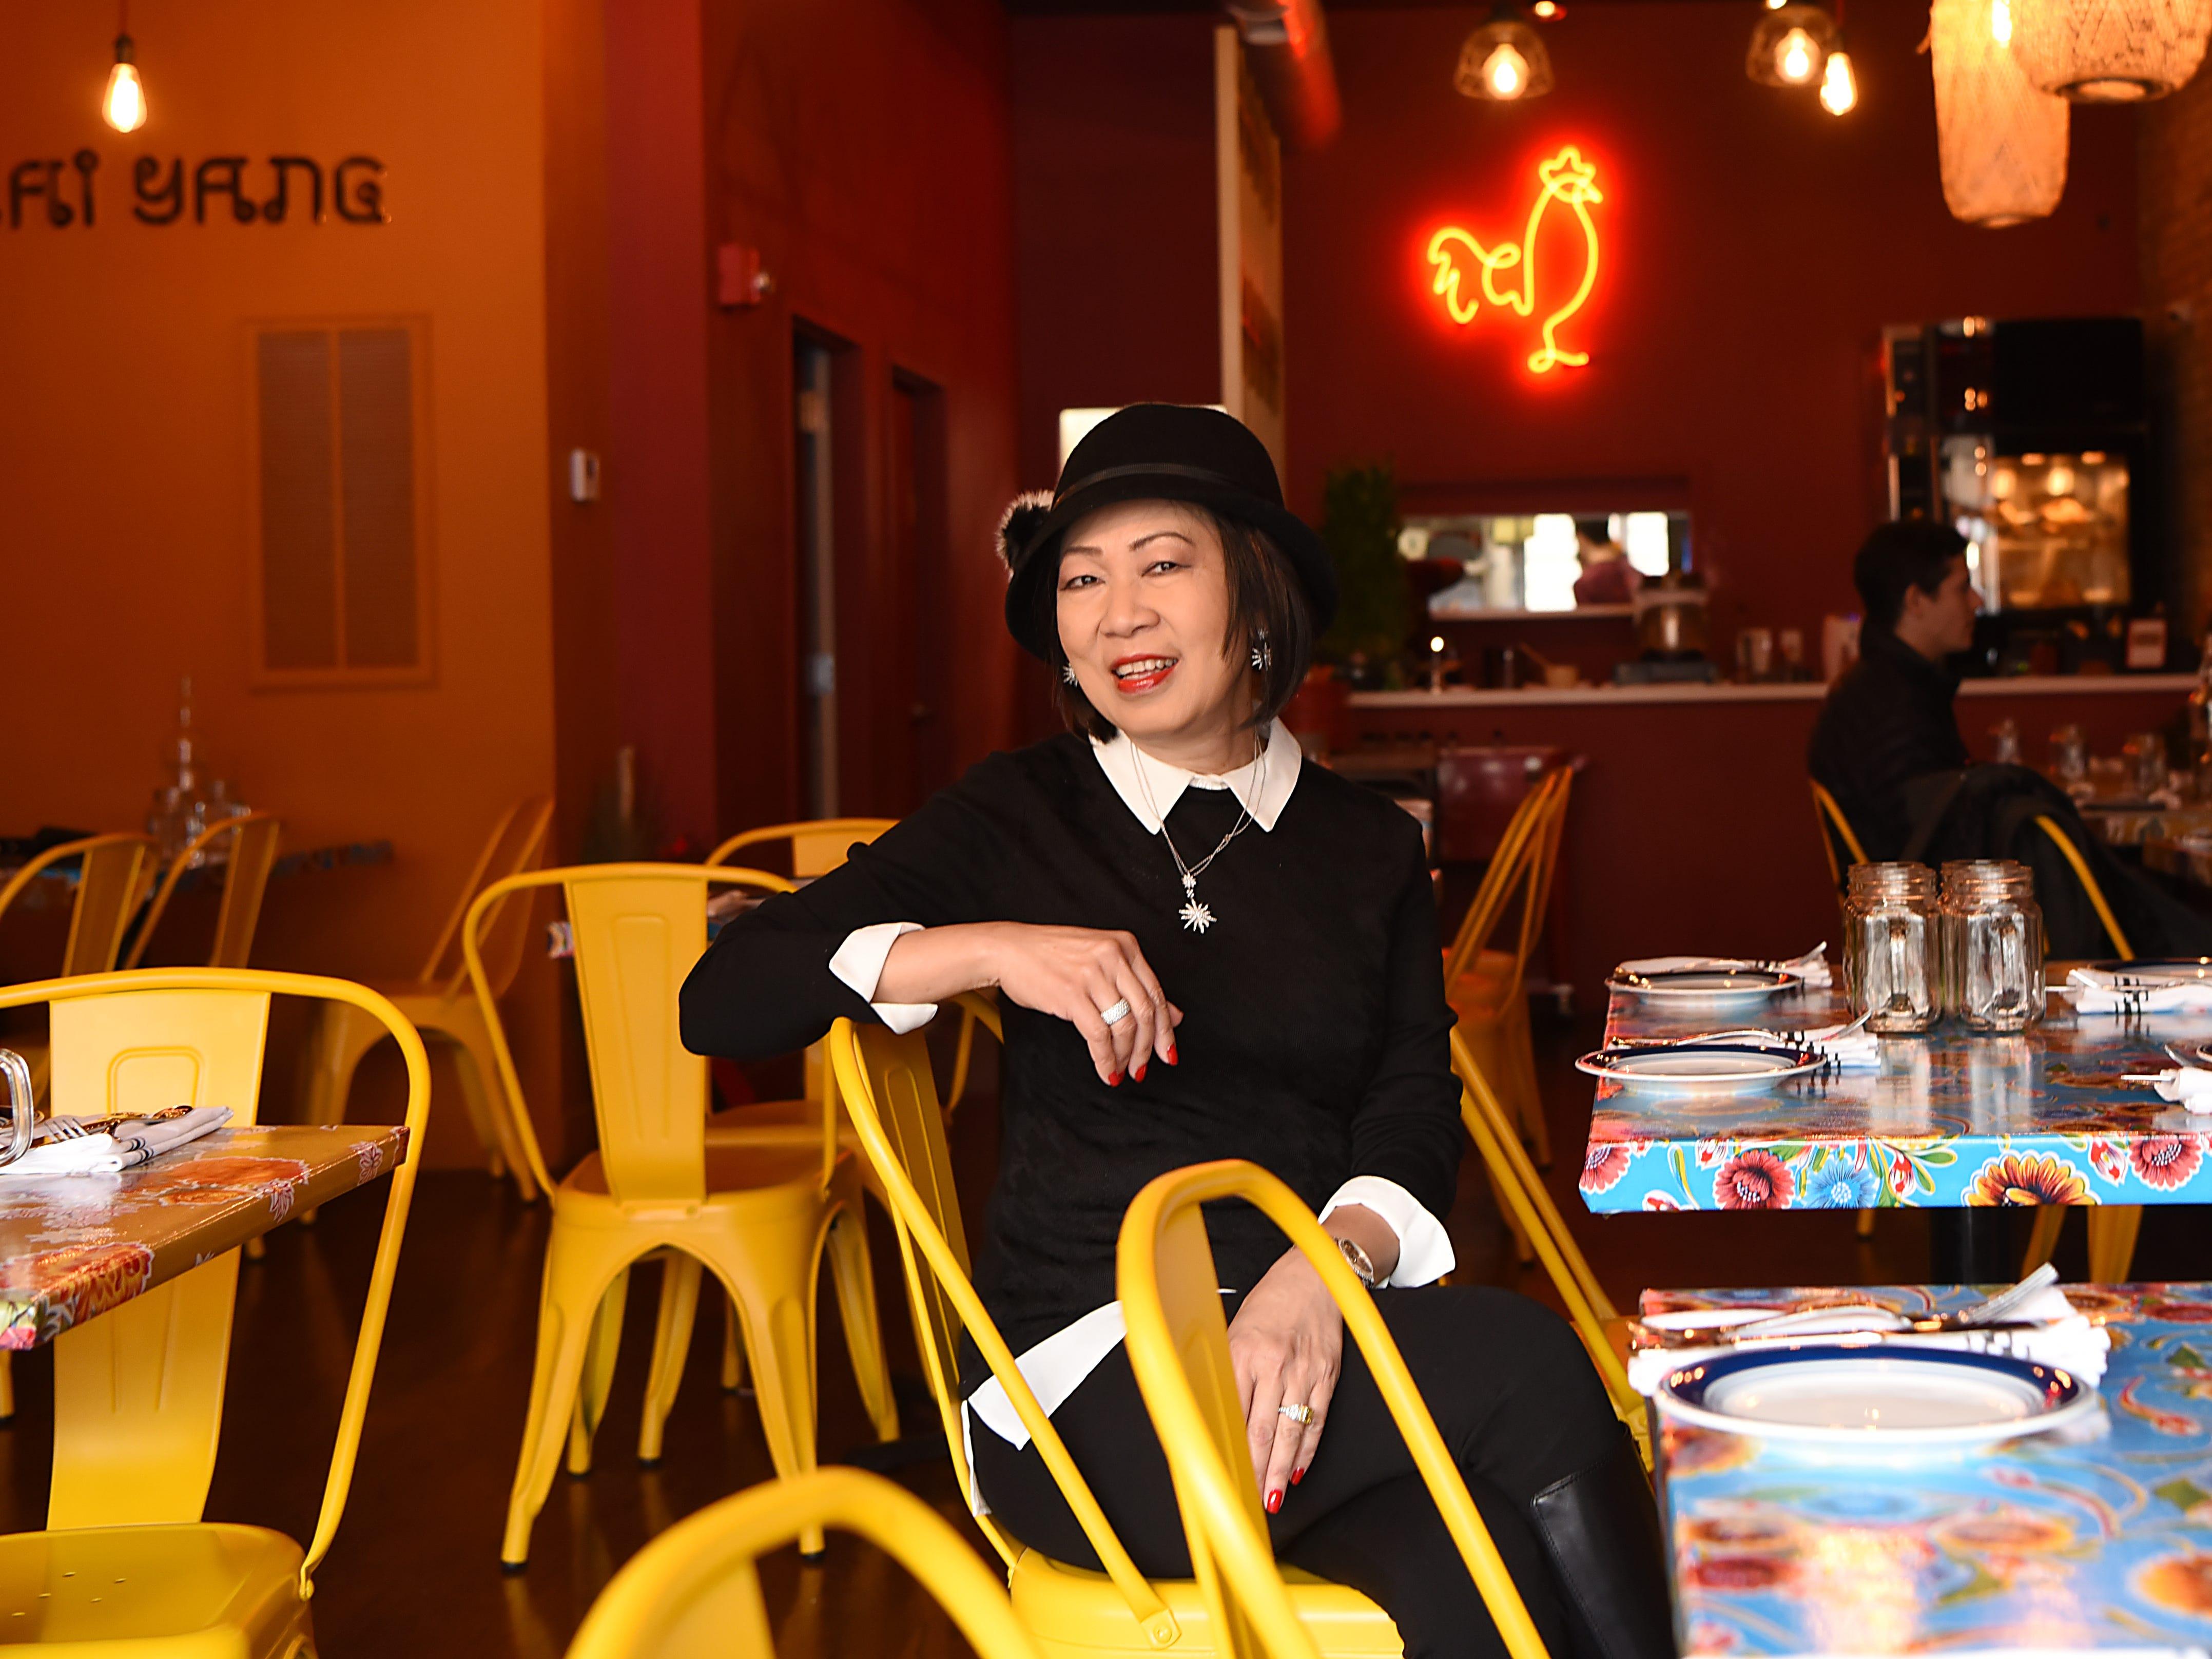 Sheree Sarabhaya and her son Luck Sarabhayavinija both own restaurants on Bloomfield Avenue in Montclair. Sheree Sarabhaya owner of Kai Yang, poses for photos on Thursday December 20, 2018.